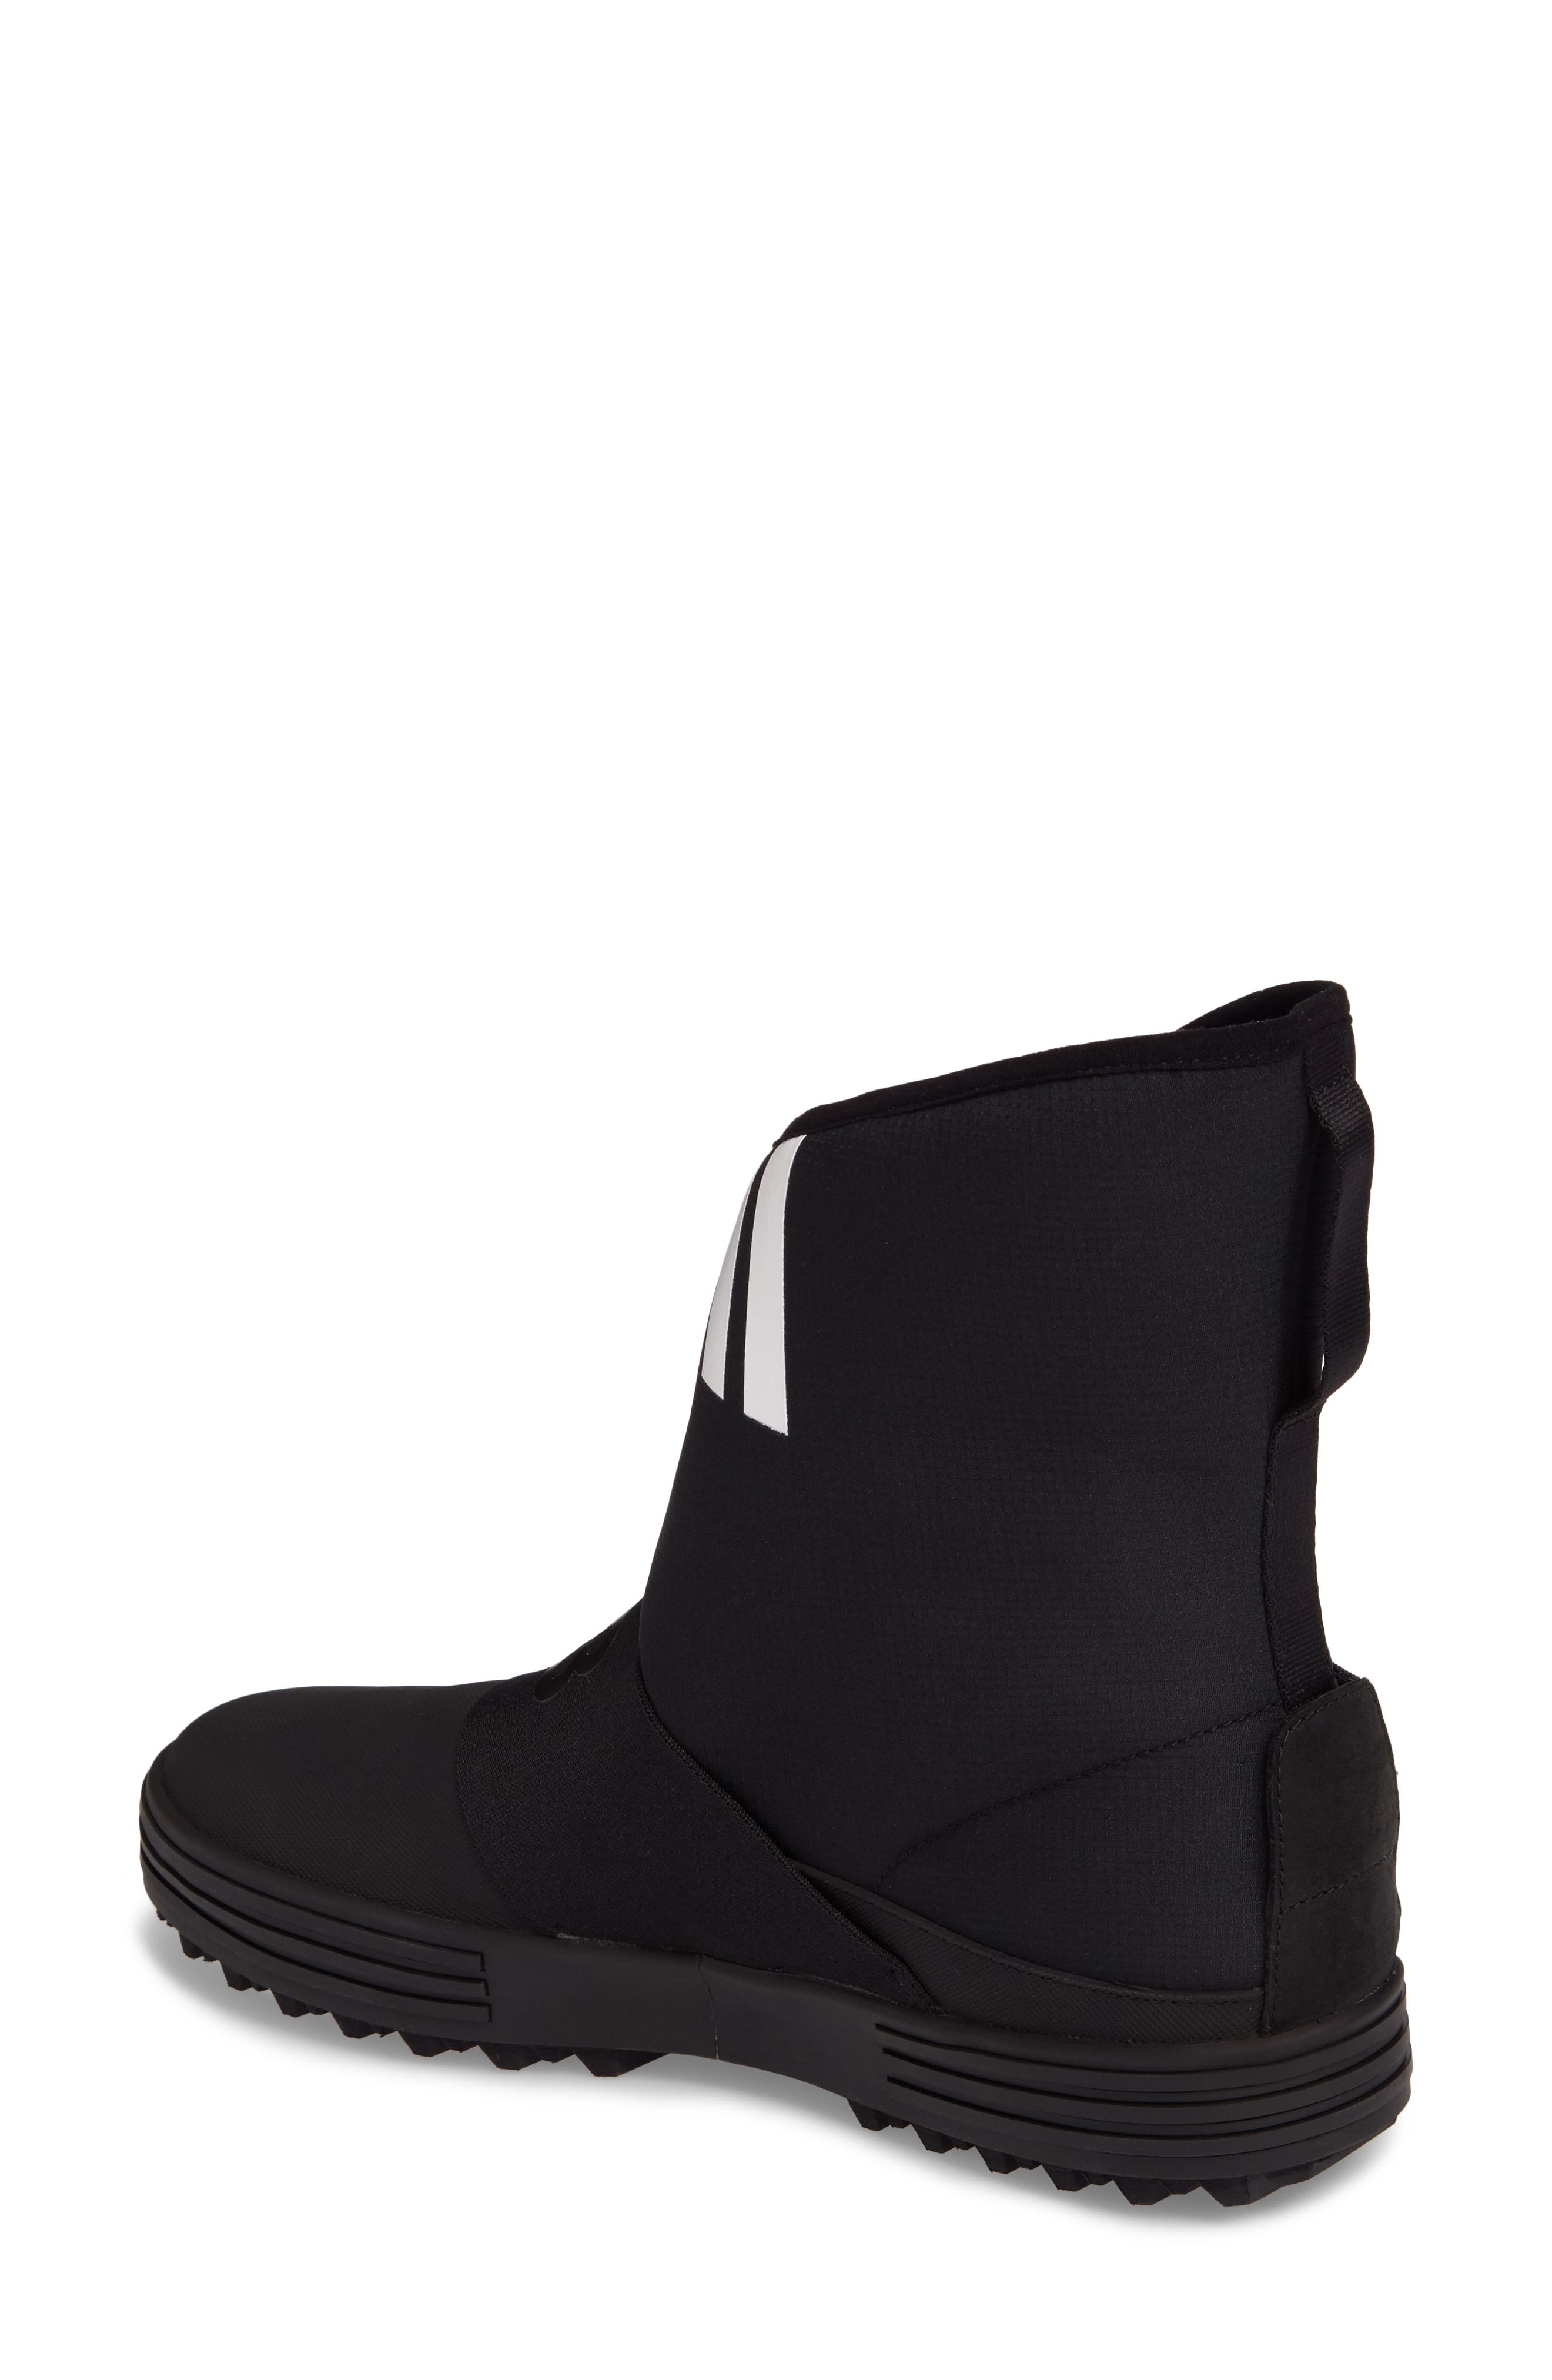 Sno Foxing High Top Sneaker,                             Alternate thumbnail 2, color,                             Core Black / White